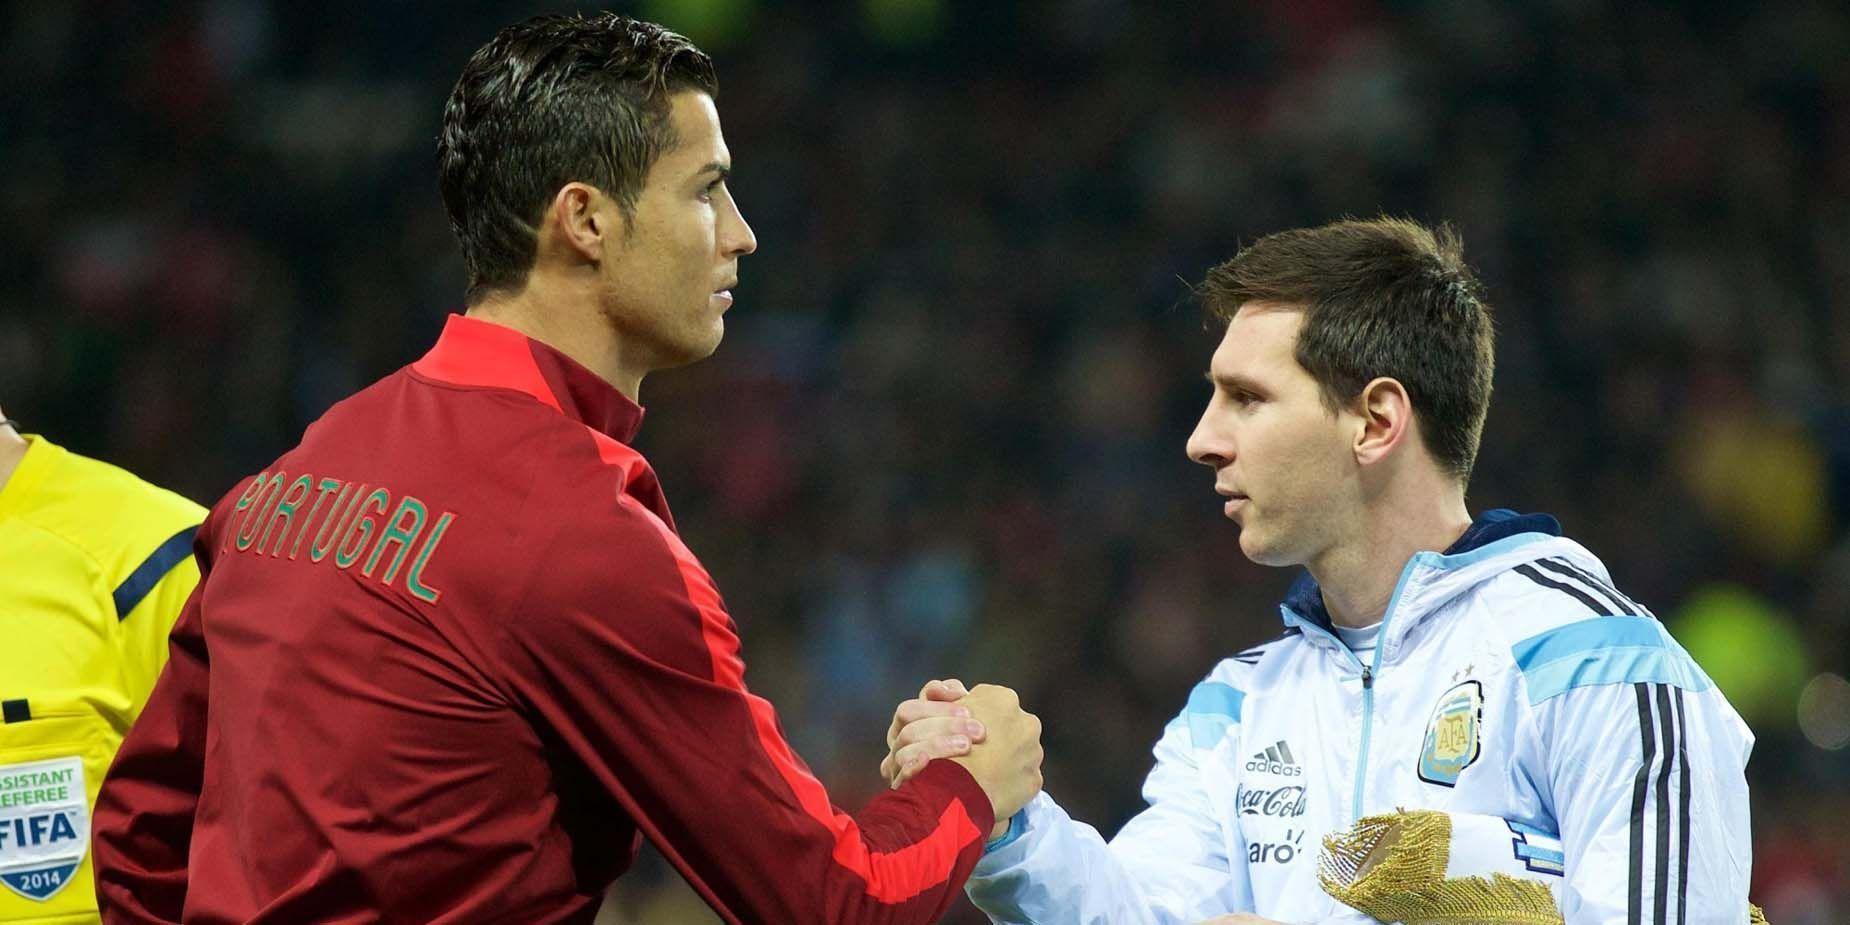 Messi Vs Ronaldo Wallpaper 2016 , HD Wallpaper & Backgrounds